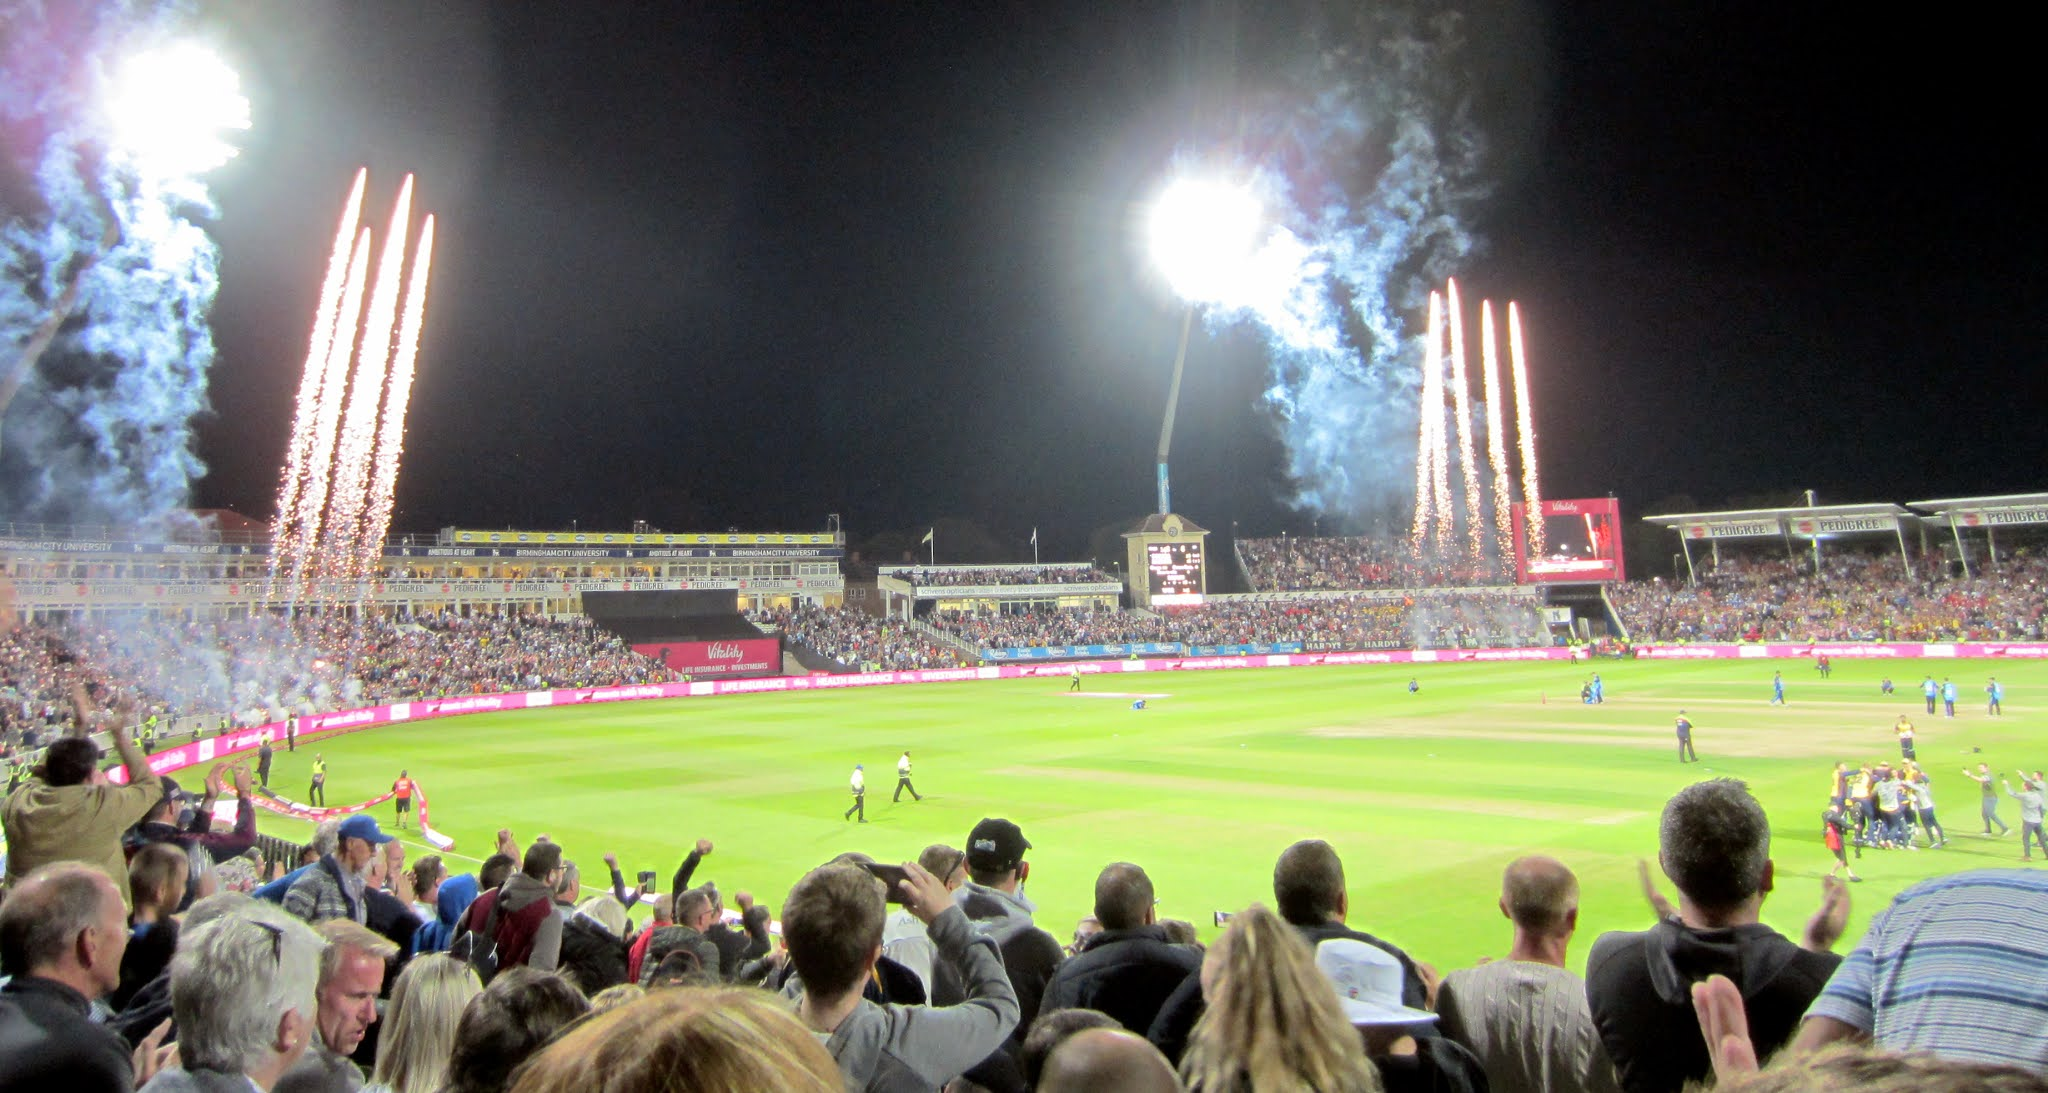 Fireworks at Edgbaston Stadium